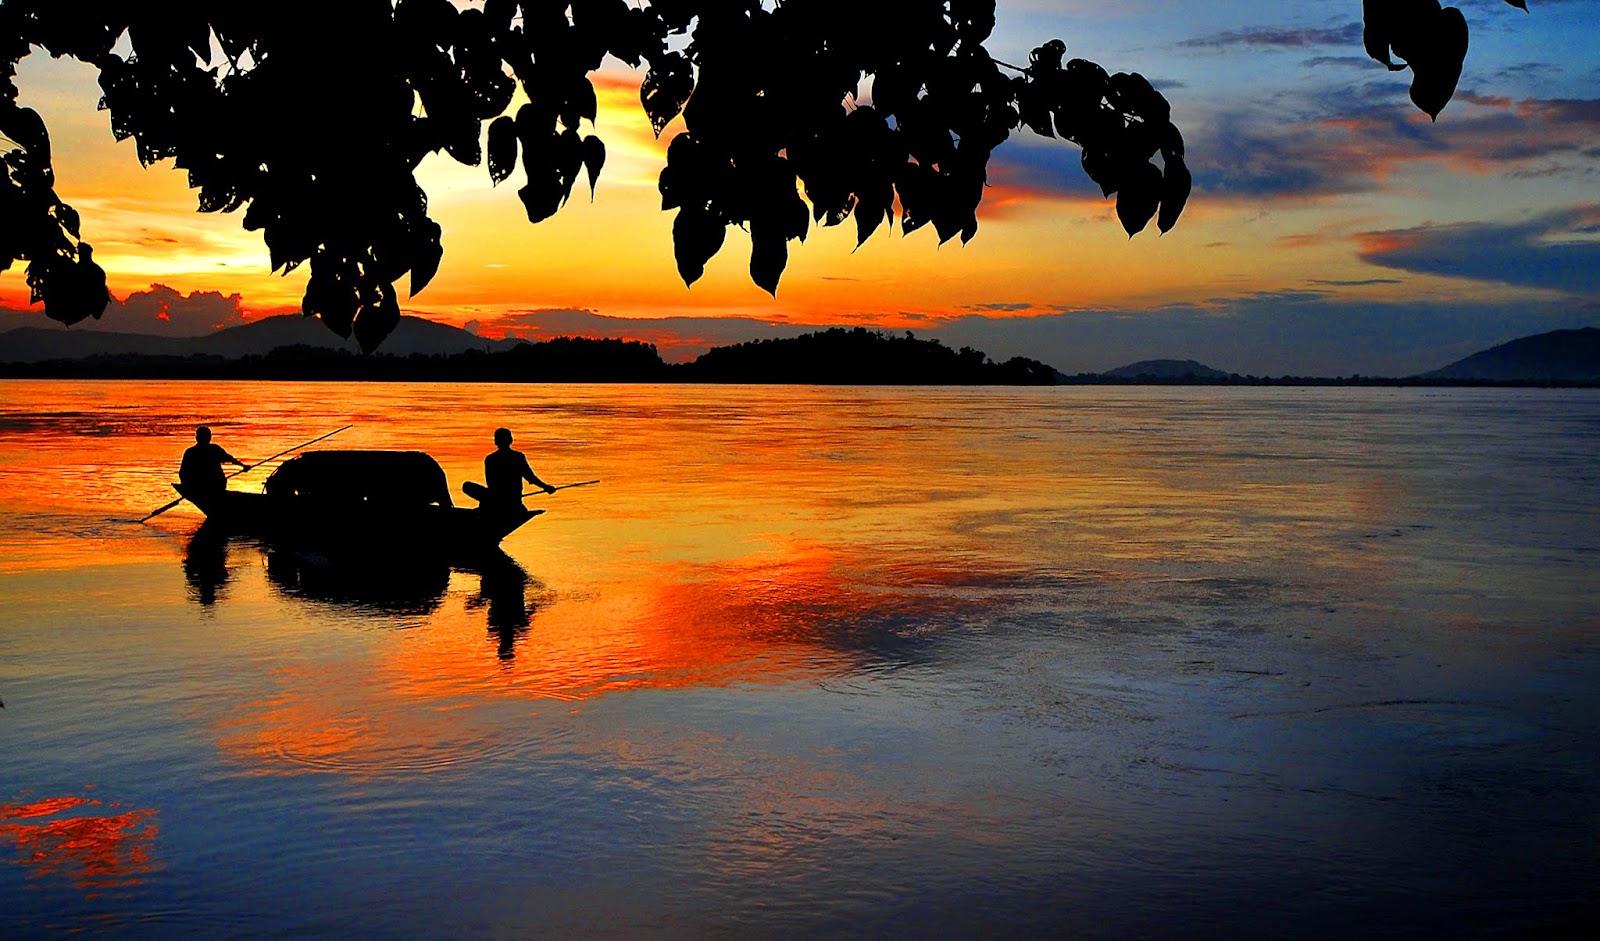 Bangladesh wallpapers view print download beautiful evening bangladesh brahmaputra river full - Bangladesh wallpaper download ...